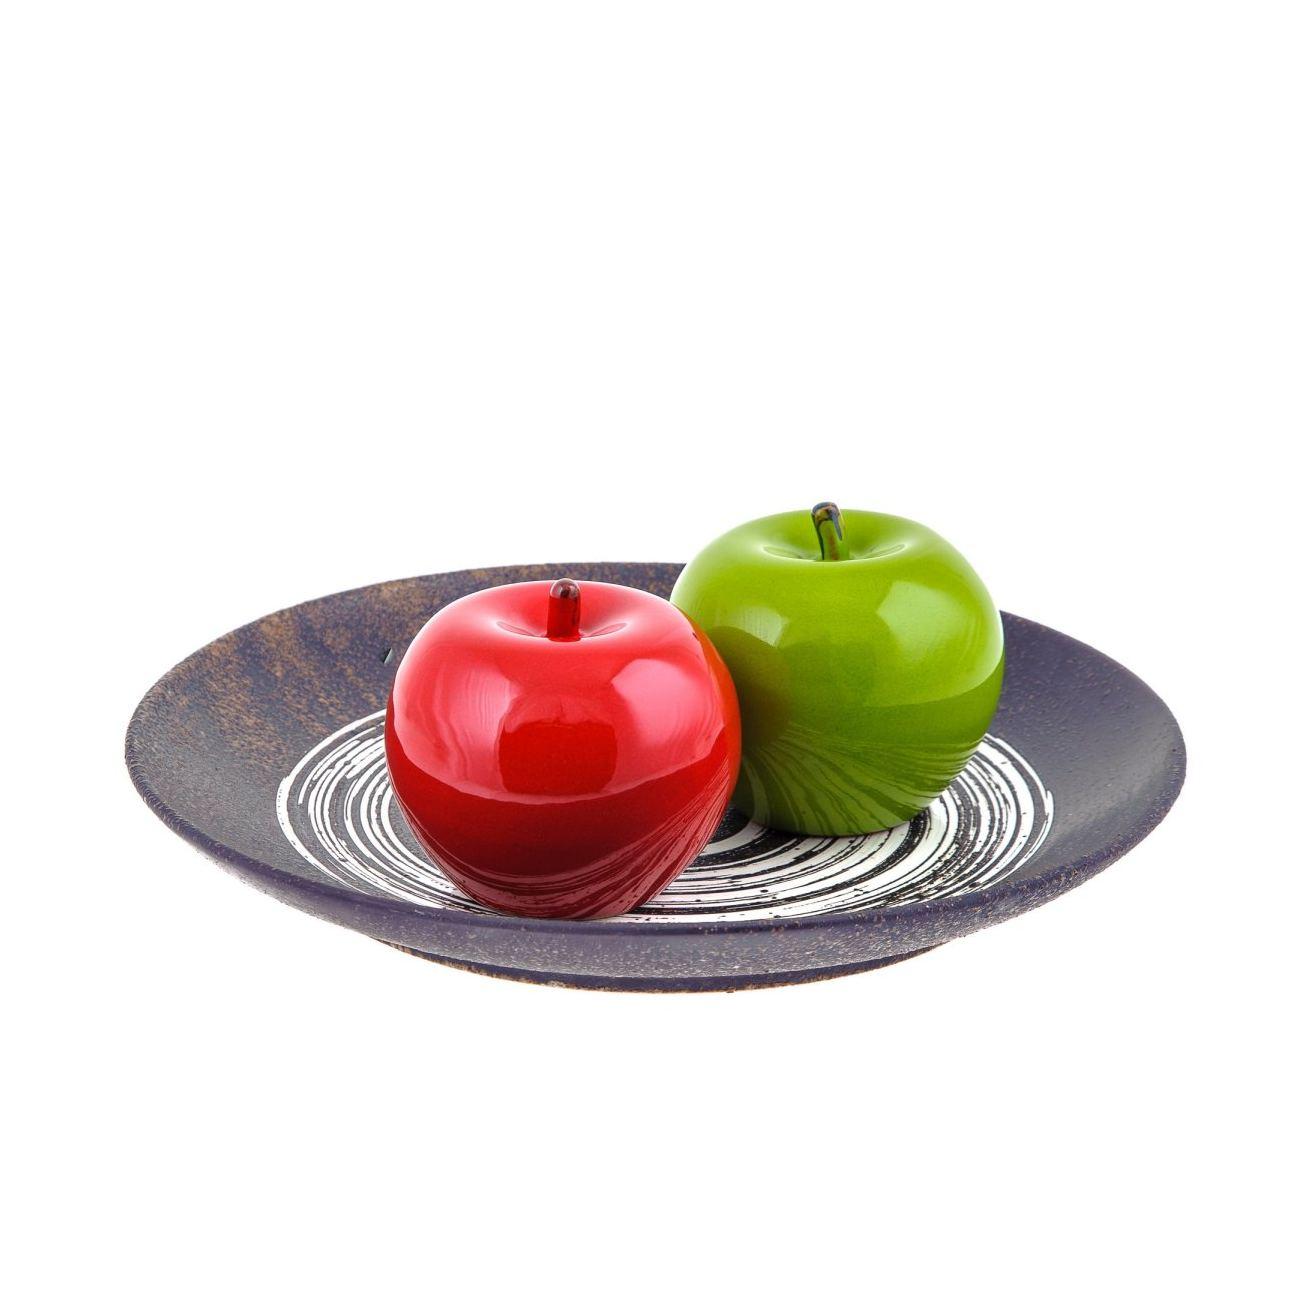 Red Apple - Modern Handmade Ceramic Decor Ornament - 3.9\'\' (10cm)